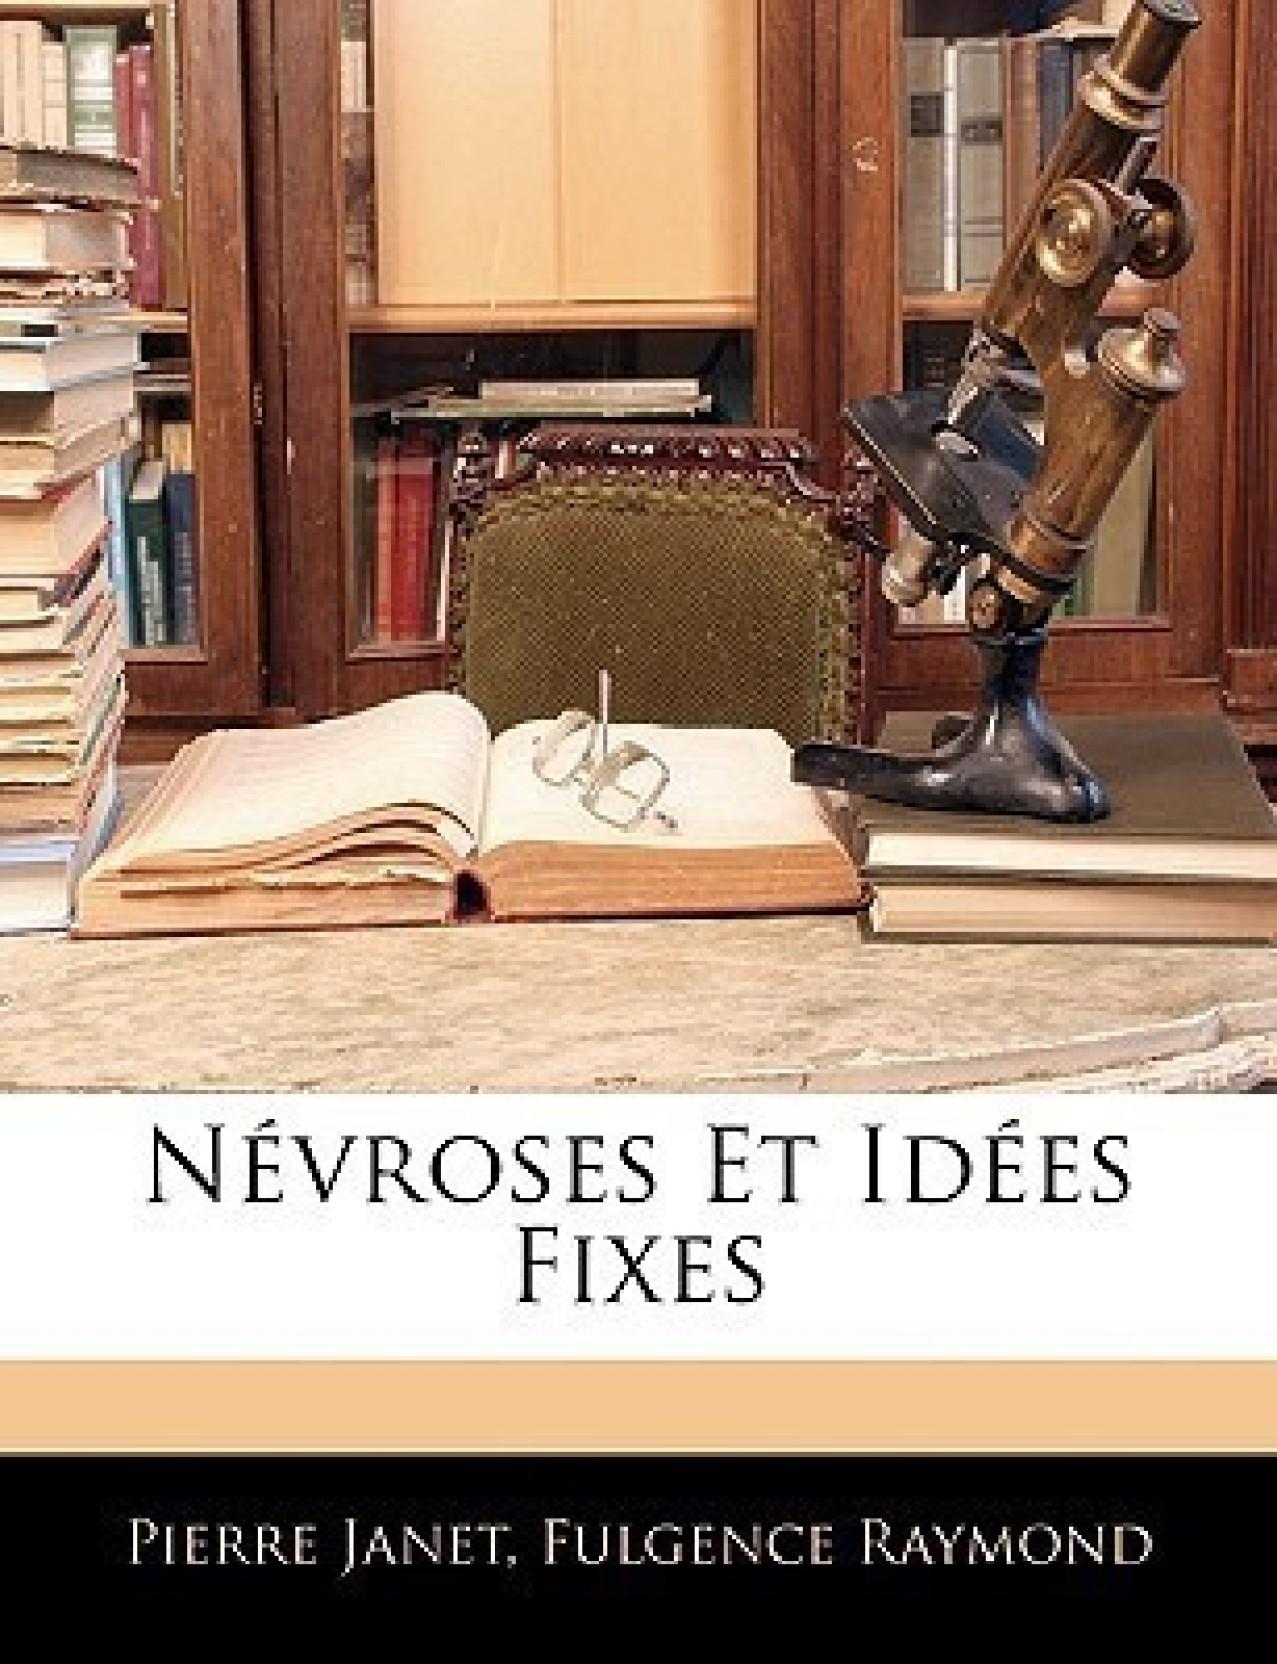 Nevroses Et Idees Fixes: Buy Nevroses Et Idees Fixes by Janet Pierre ...